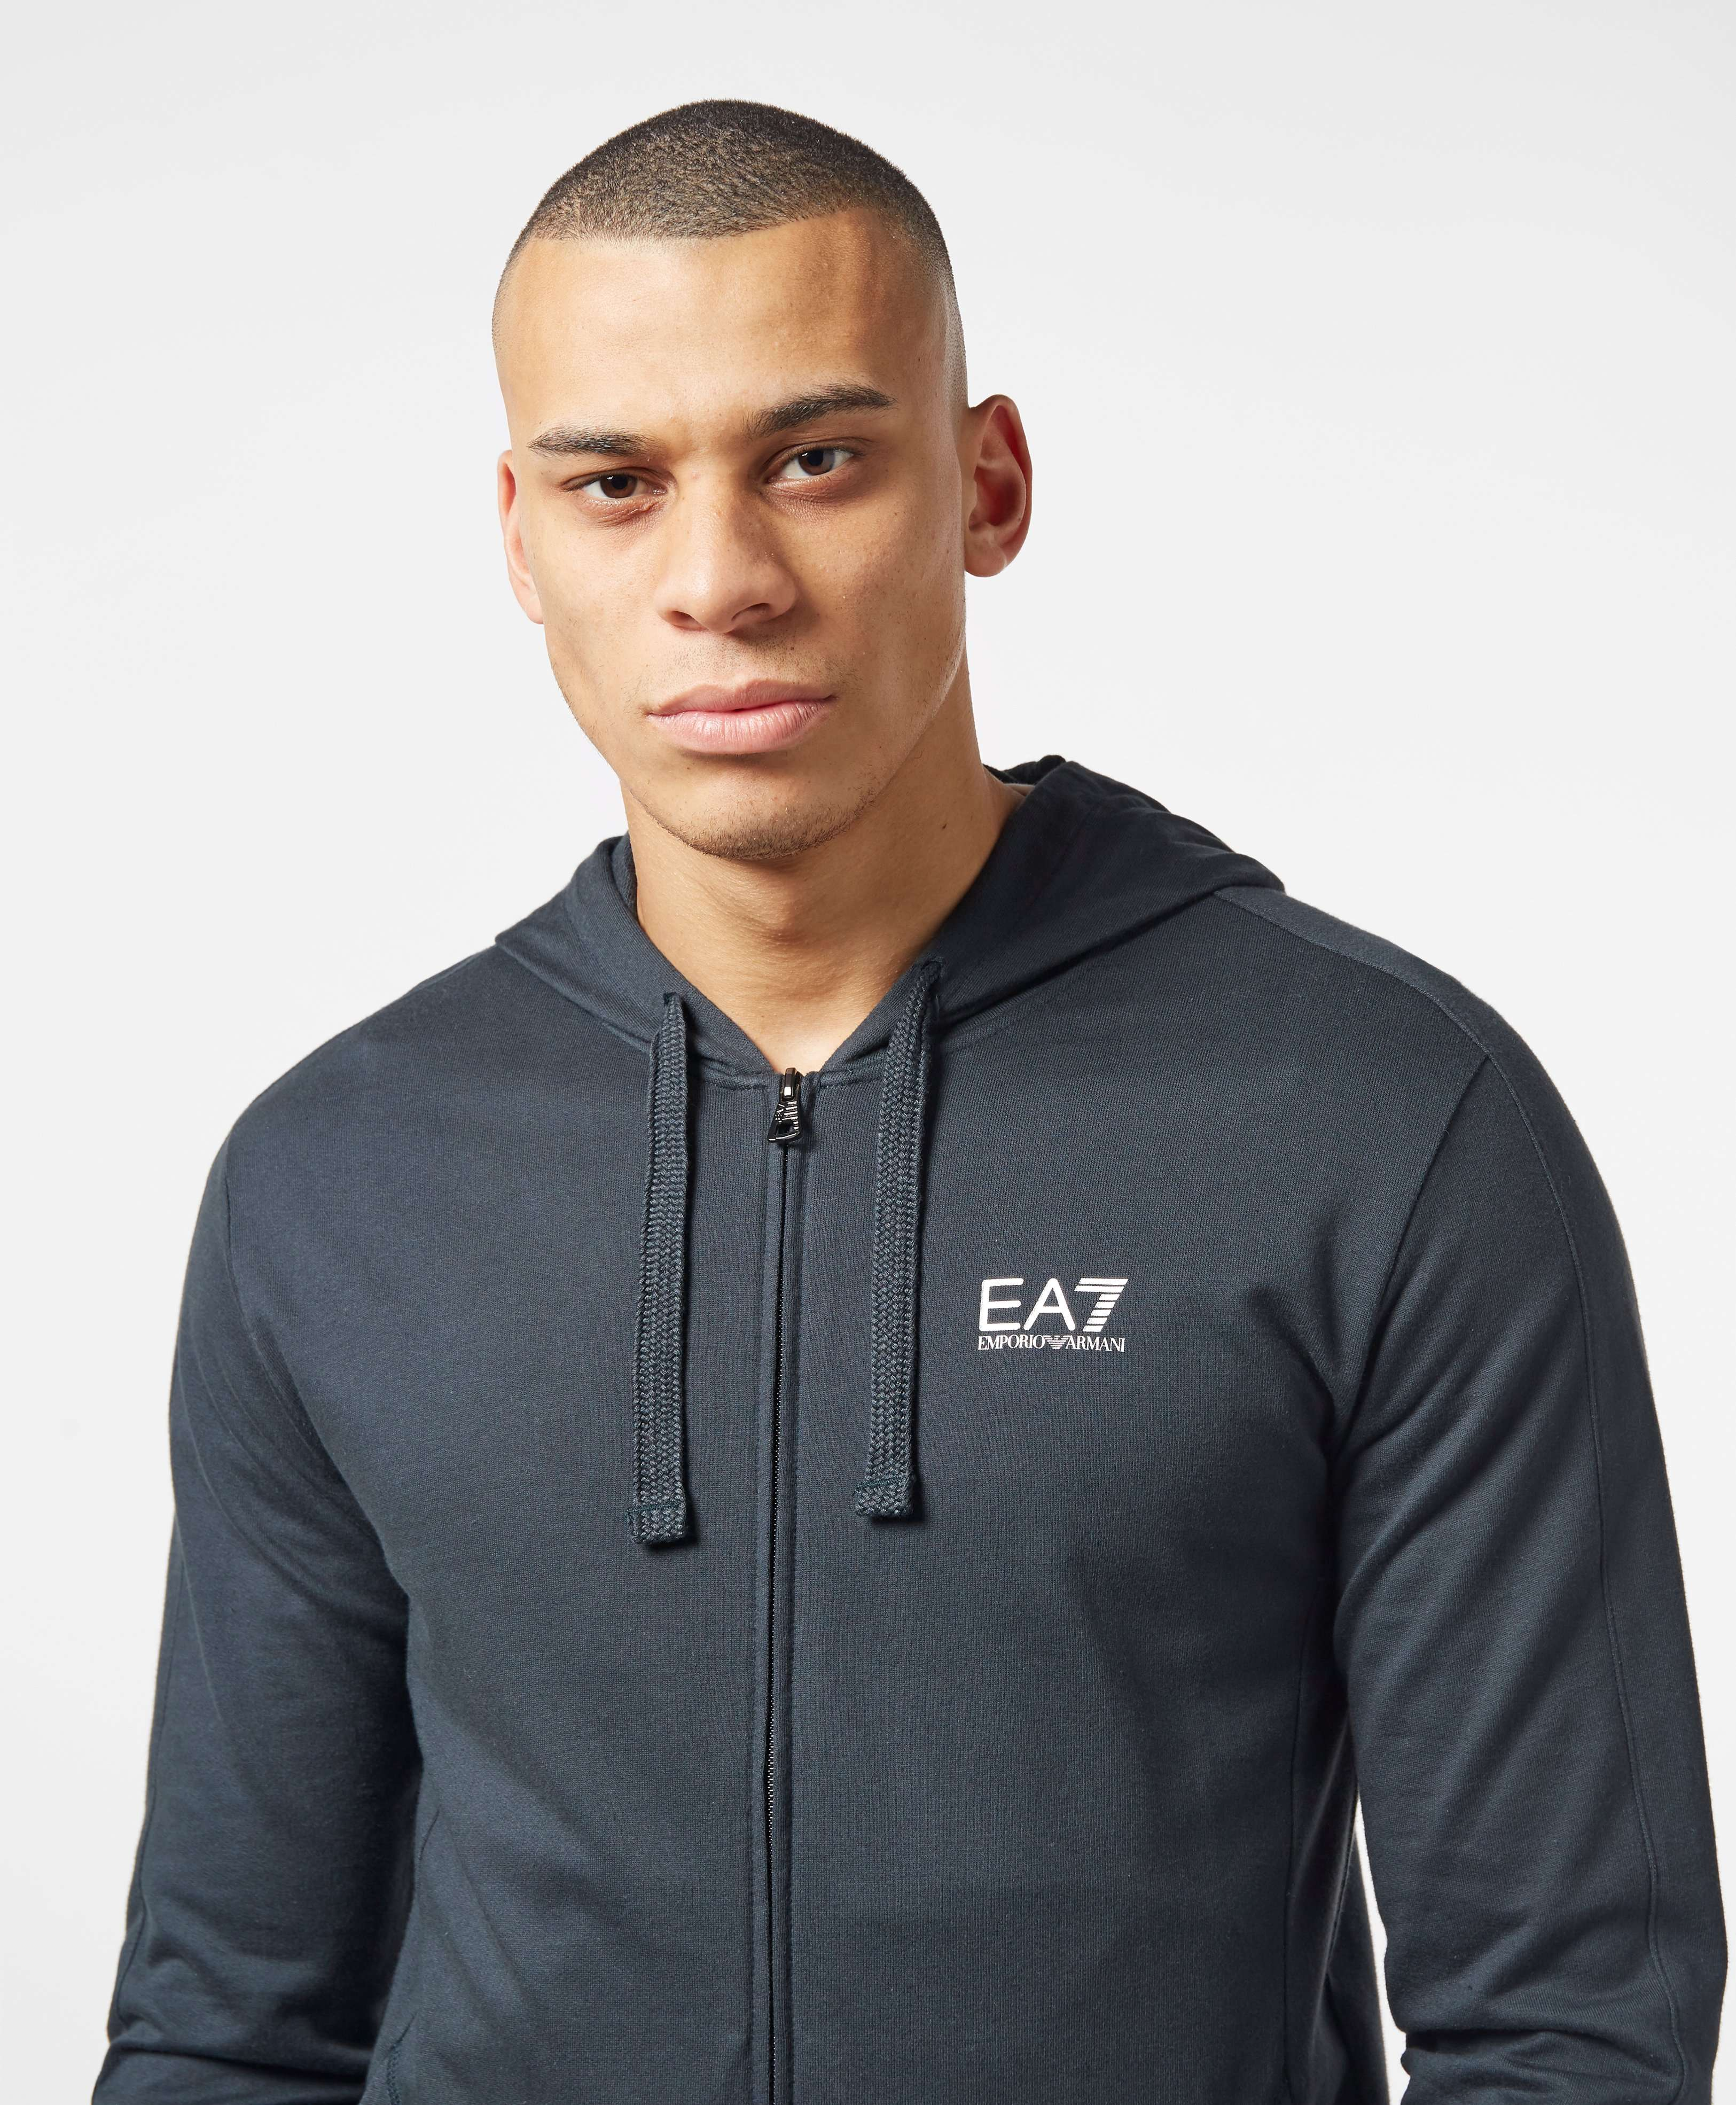 Emporio Armani EA7 Core Full Zip Hoodie - Online Exclusive